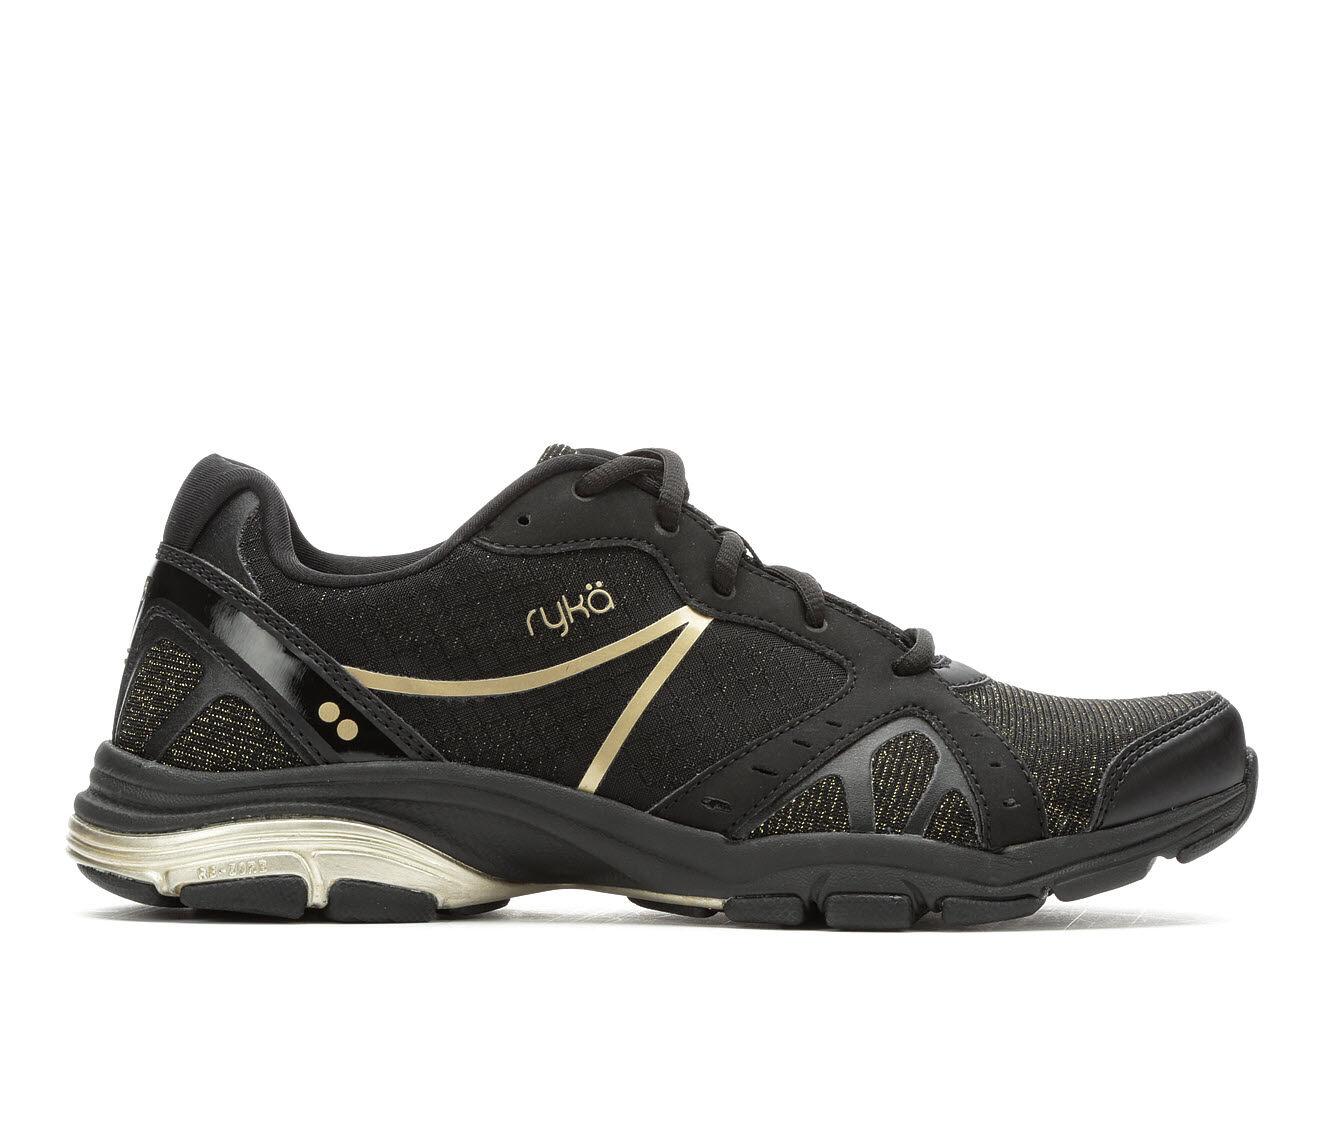 Women's Ryka Vida RZX Training Shoes Black/Gold